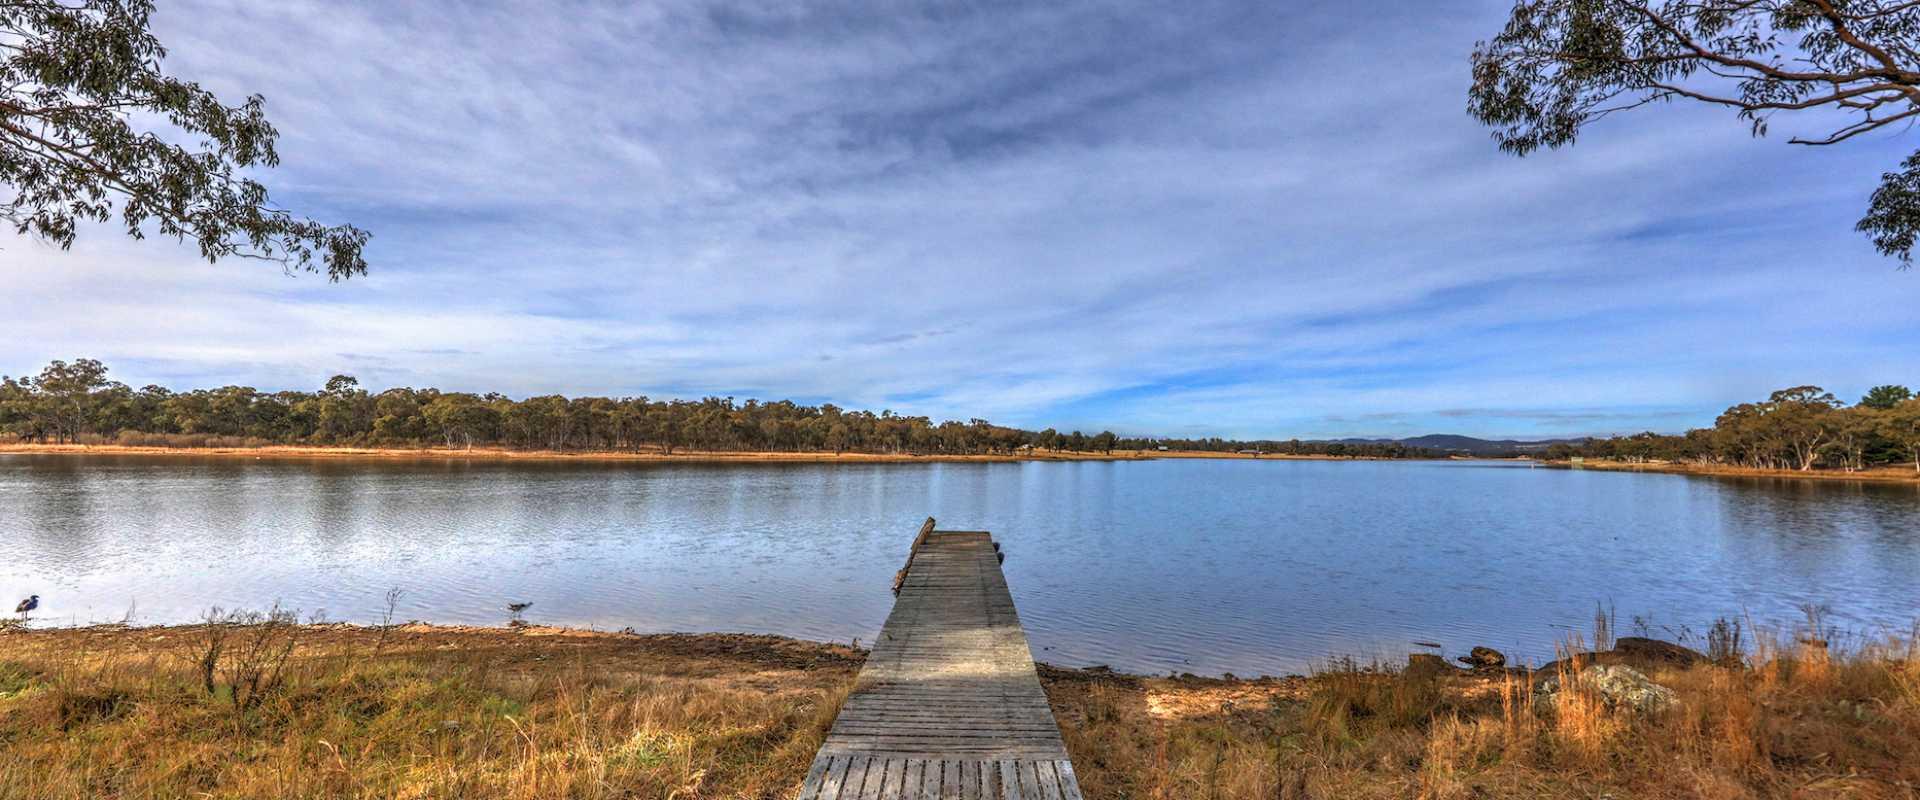 Kui Parks, Sommerville Valley Tourist Park, Stanthorpe QLD